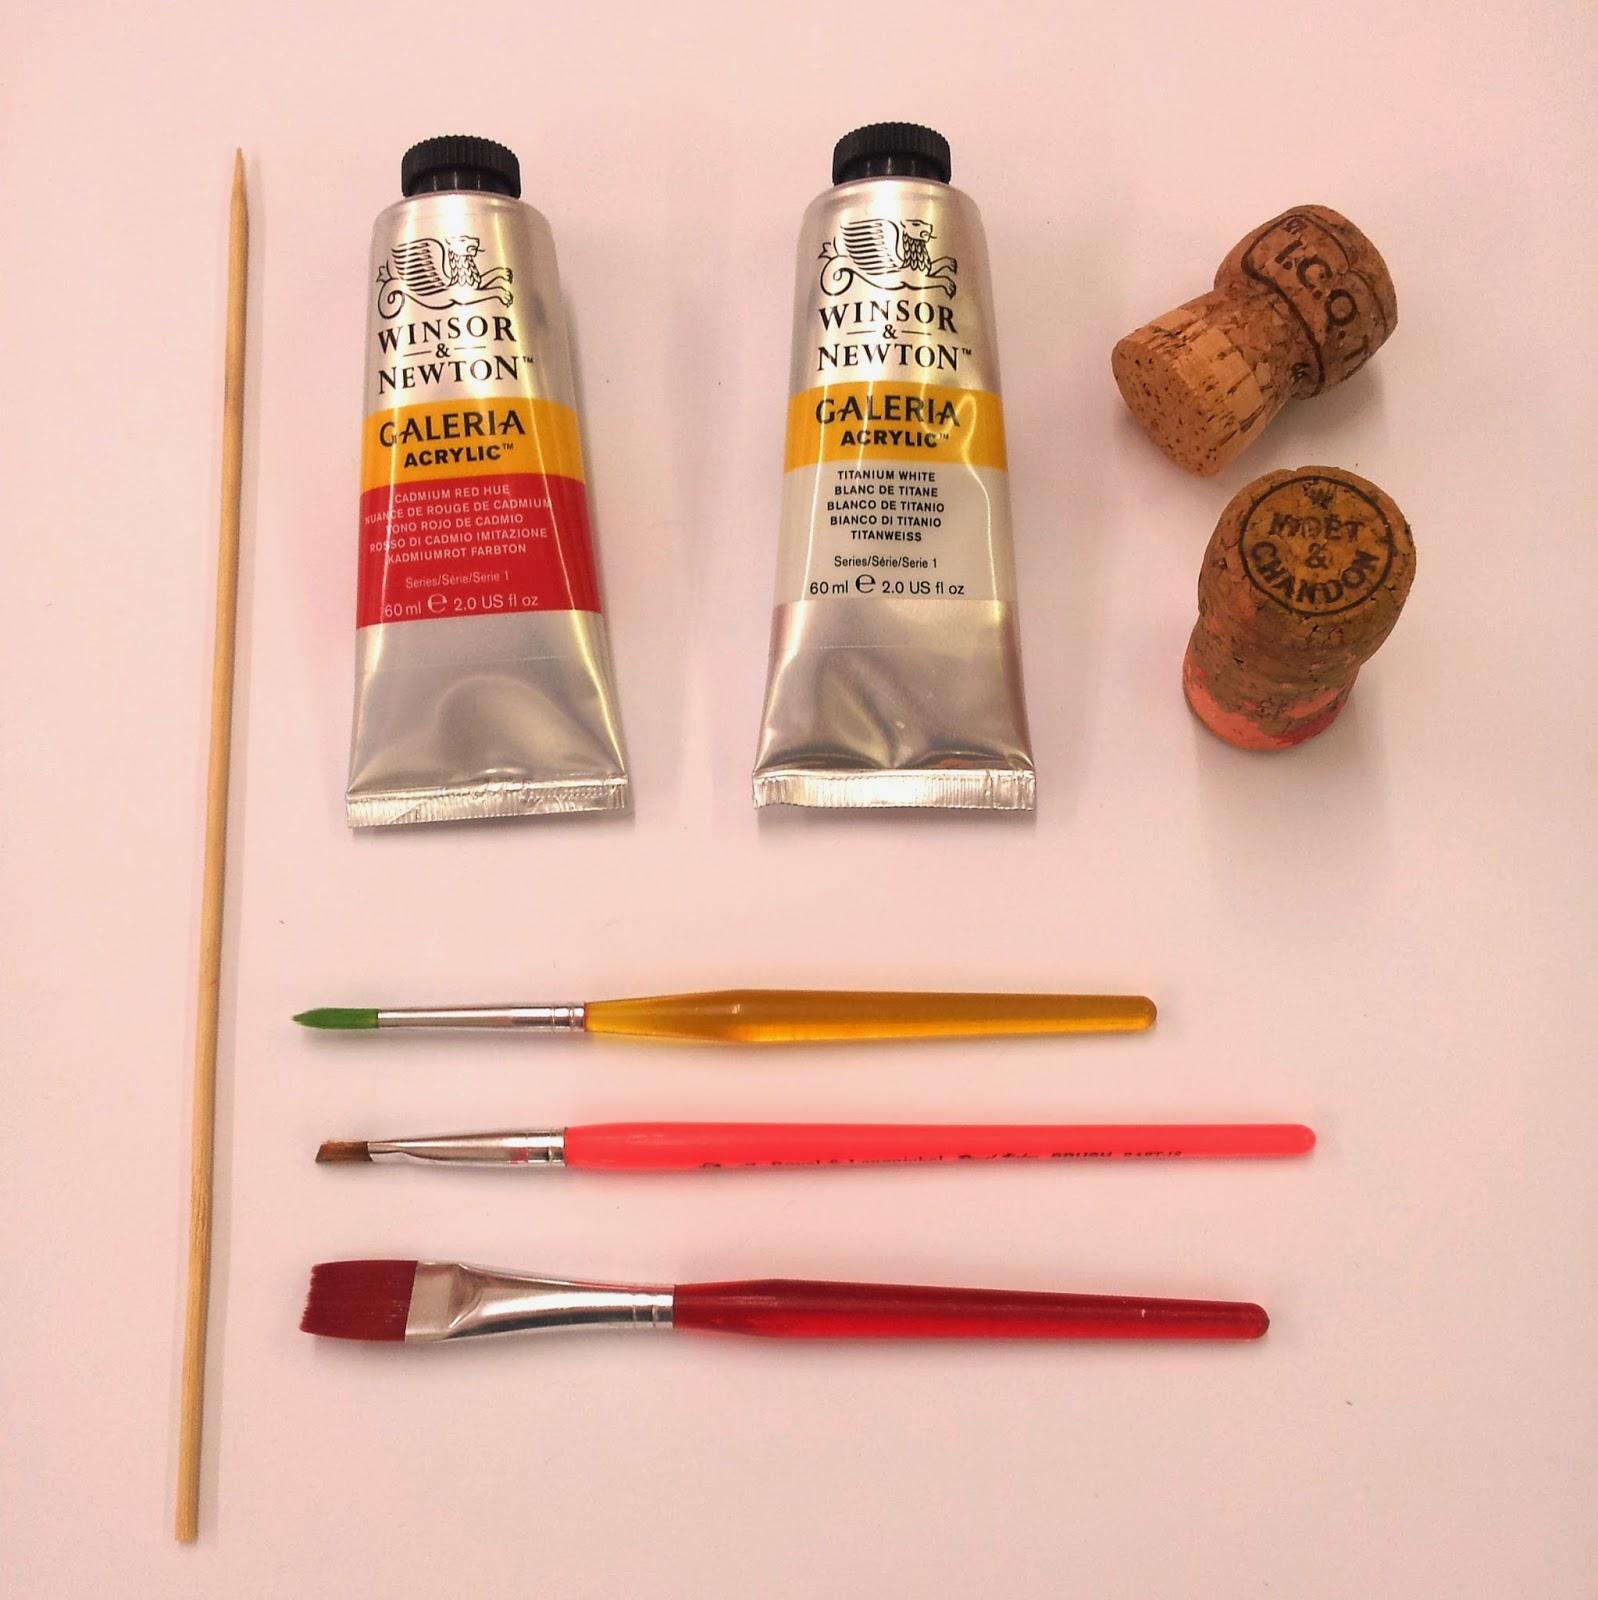 Stiff wire for crafts - Kebab Sticks Or Similar Medium Sized Paintbrush With Flat Head Thin Paintbrush With Rounded Head Stiff Wire Wirecutters Natural Craft Card